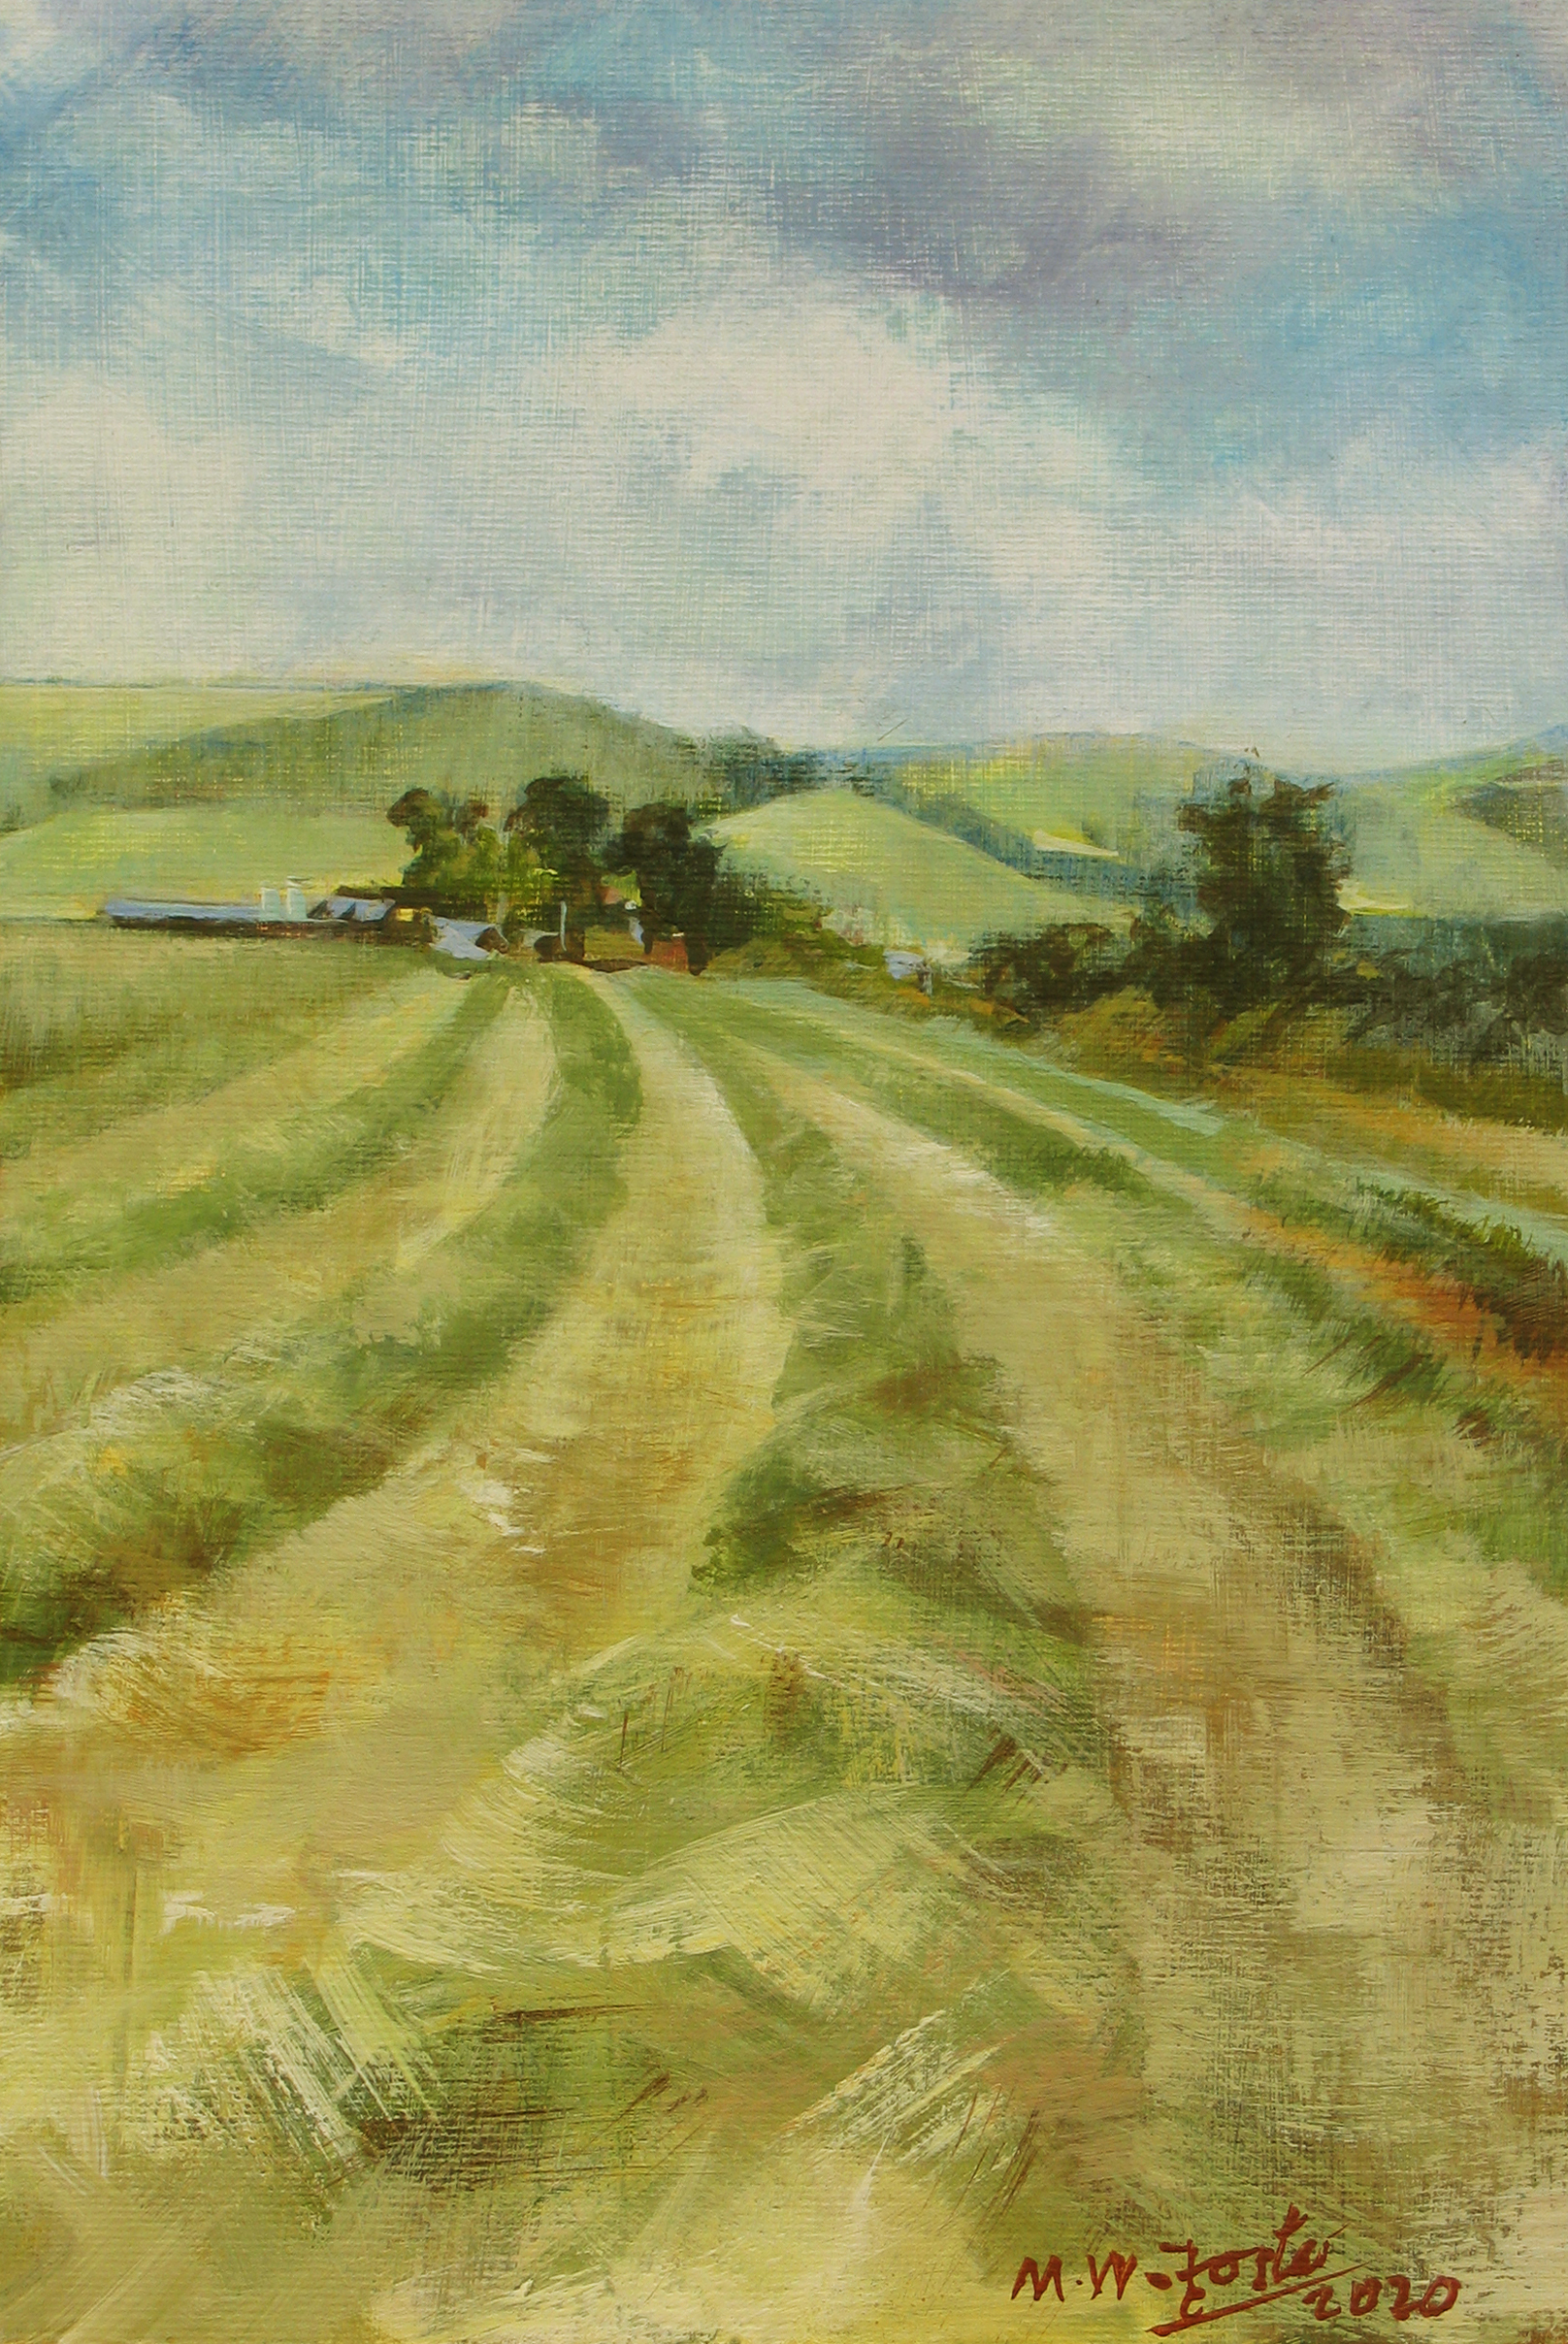 Long Mynd Haymaking